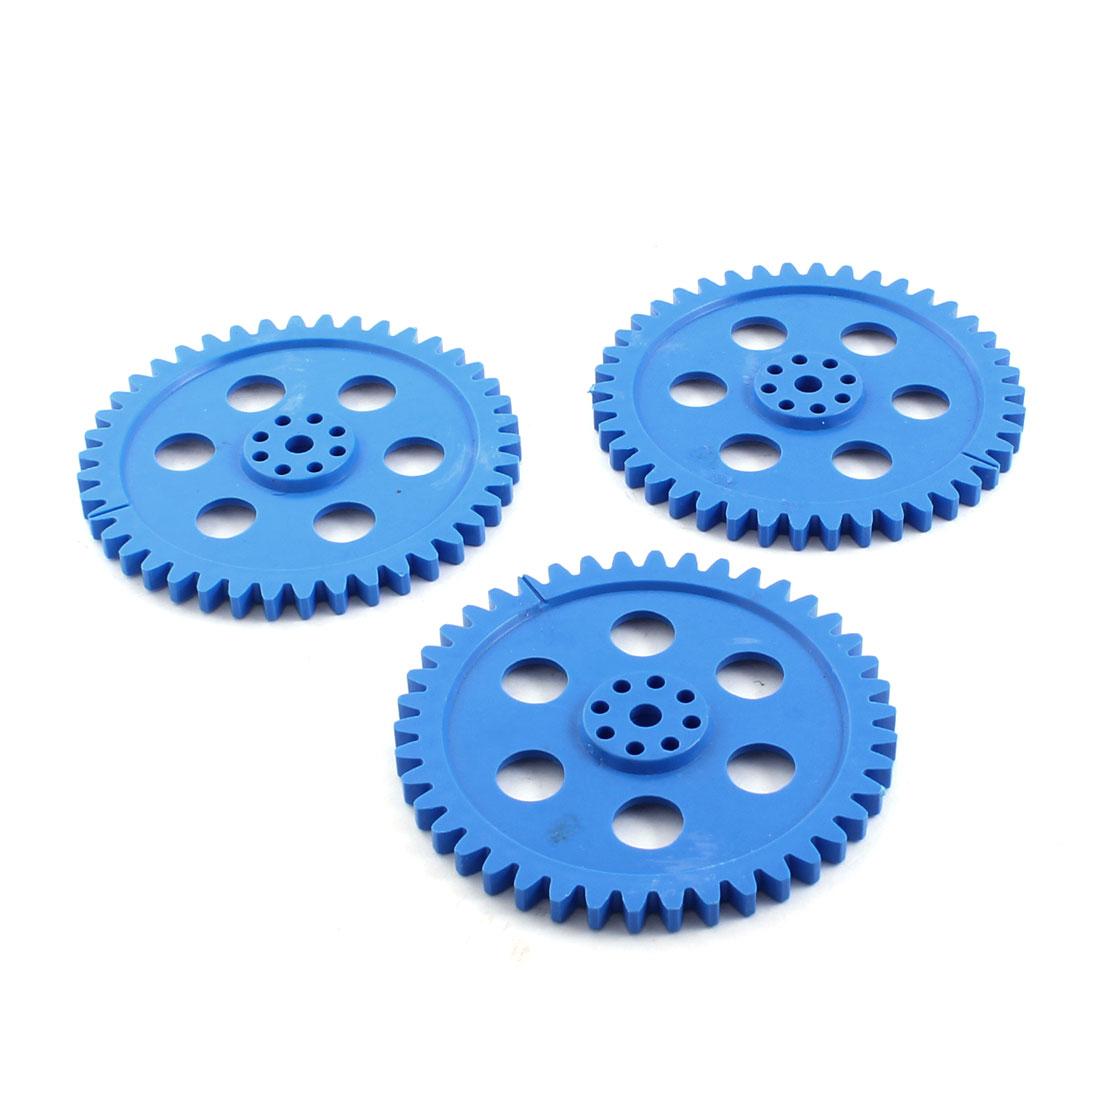 Electric Model Motor Blue Plastic 42 Teeth Gear Wheel 80mmx5mm 3 Pcs